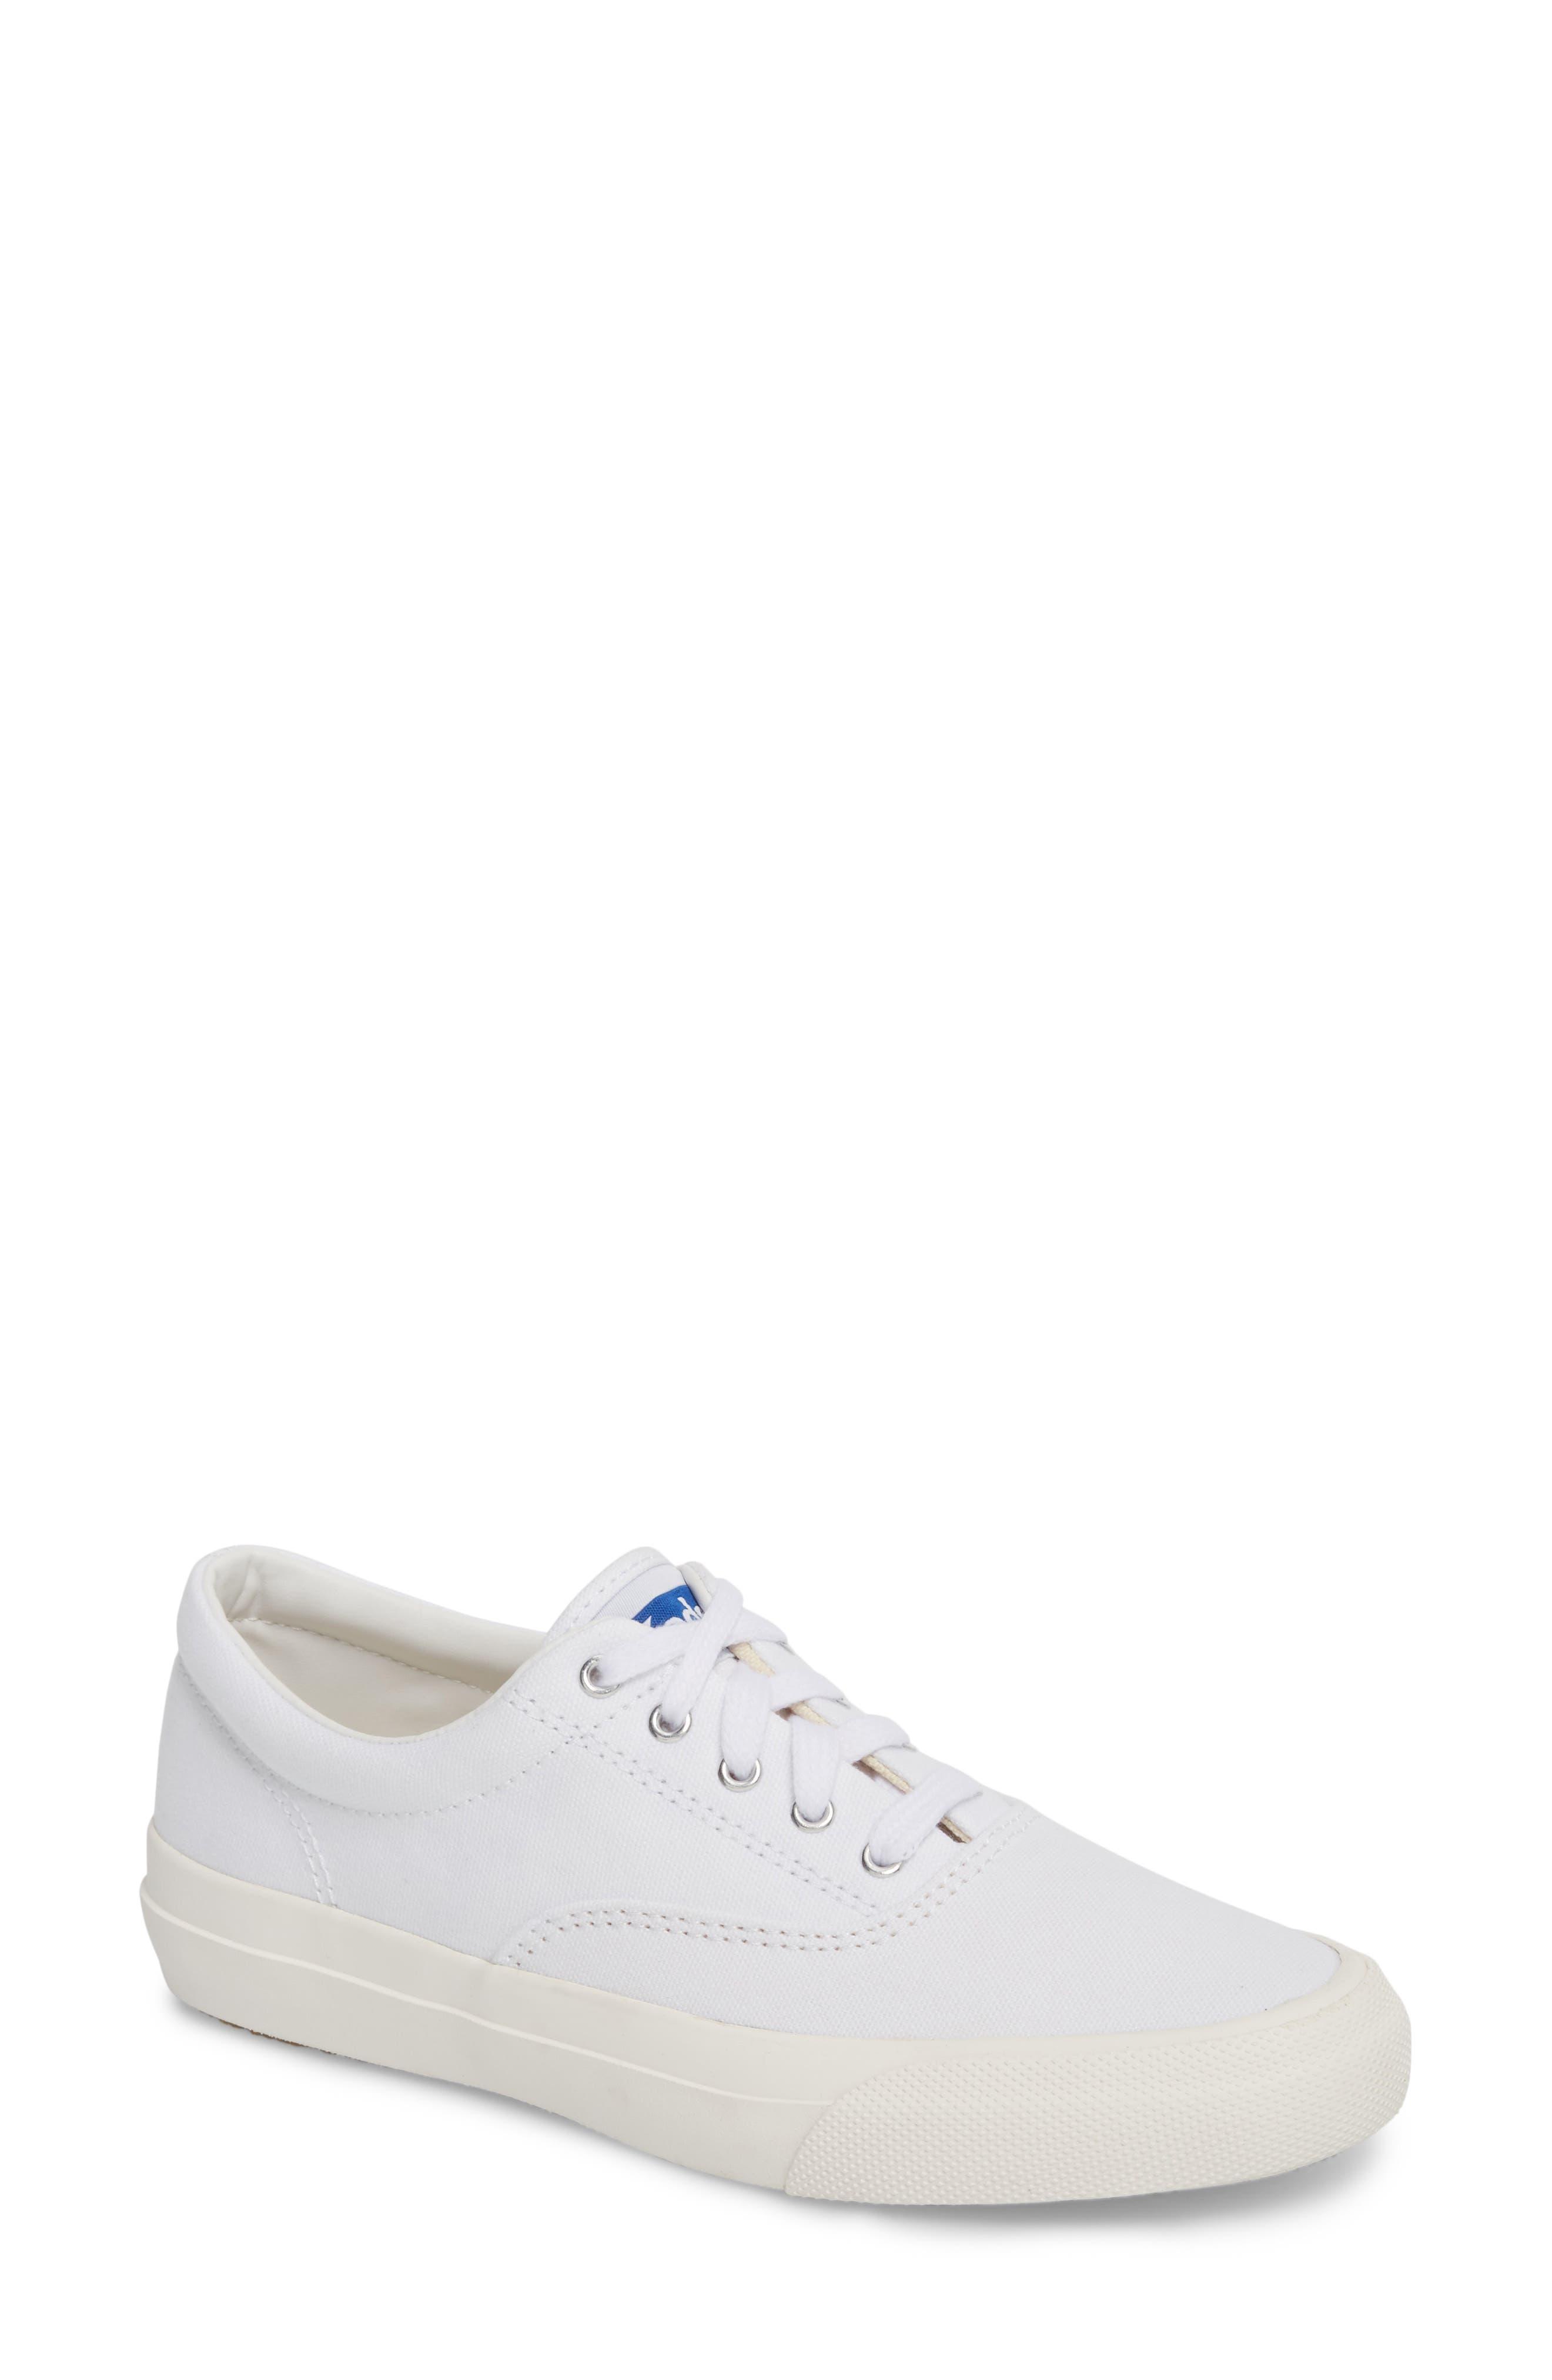 Anchor Sneaker,                             Main thumbnail 1, color,                             White